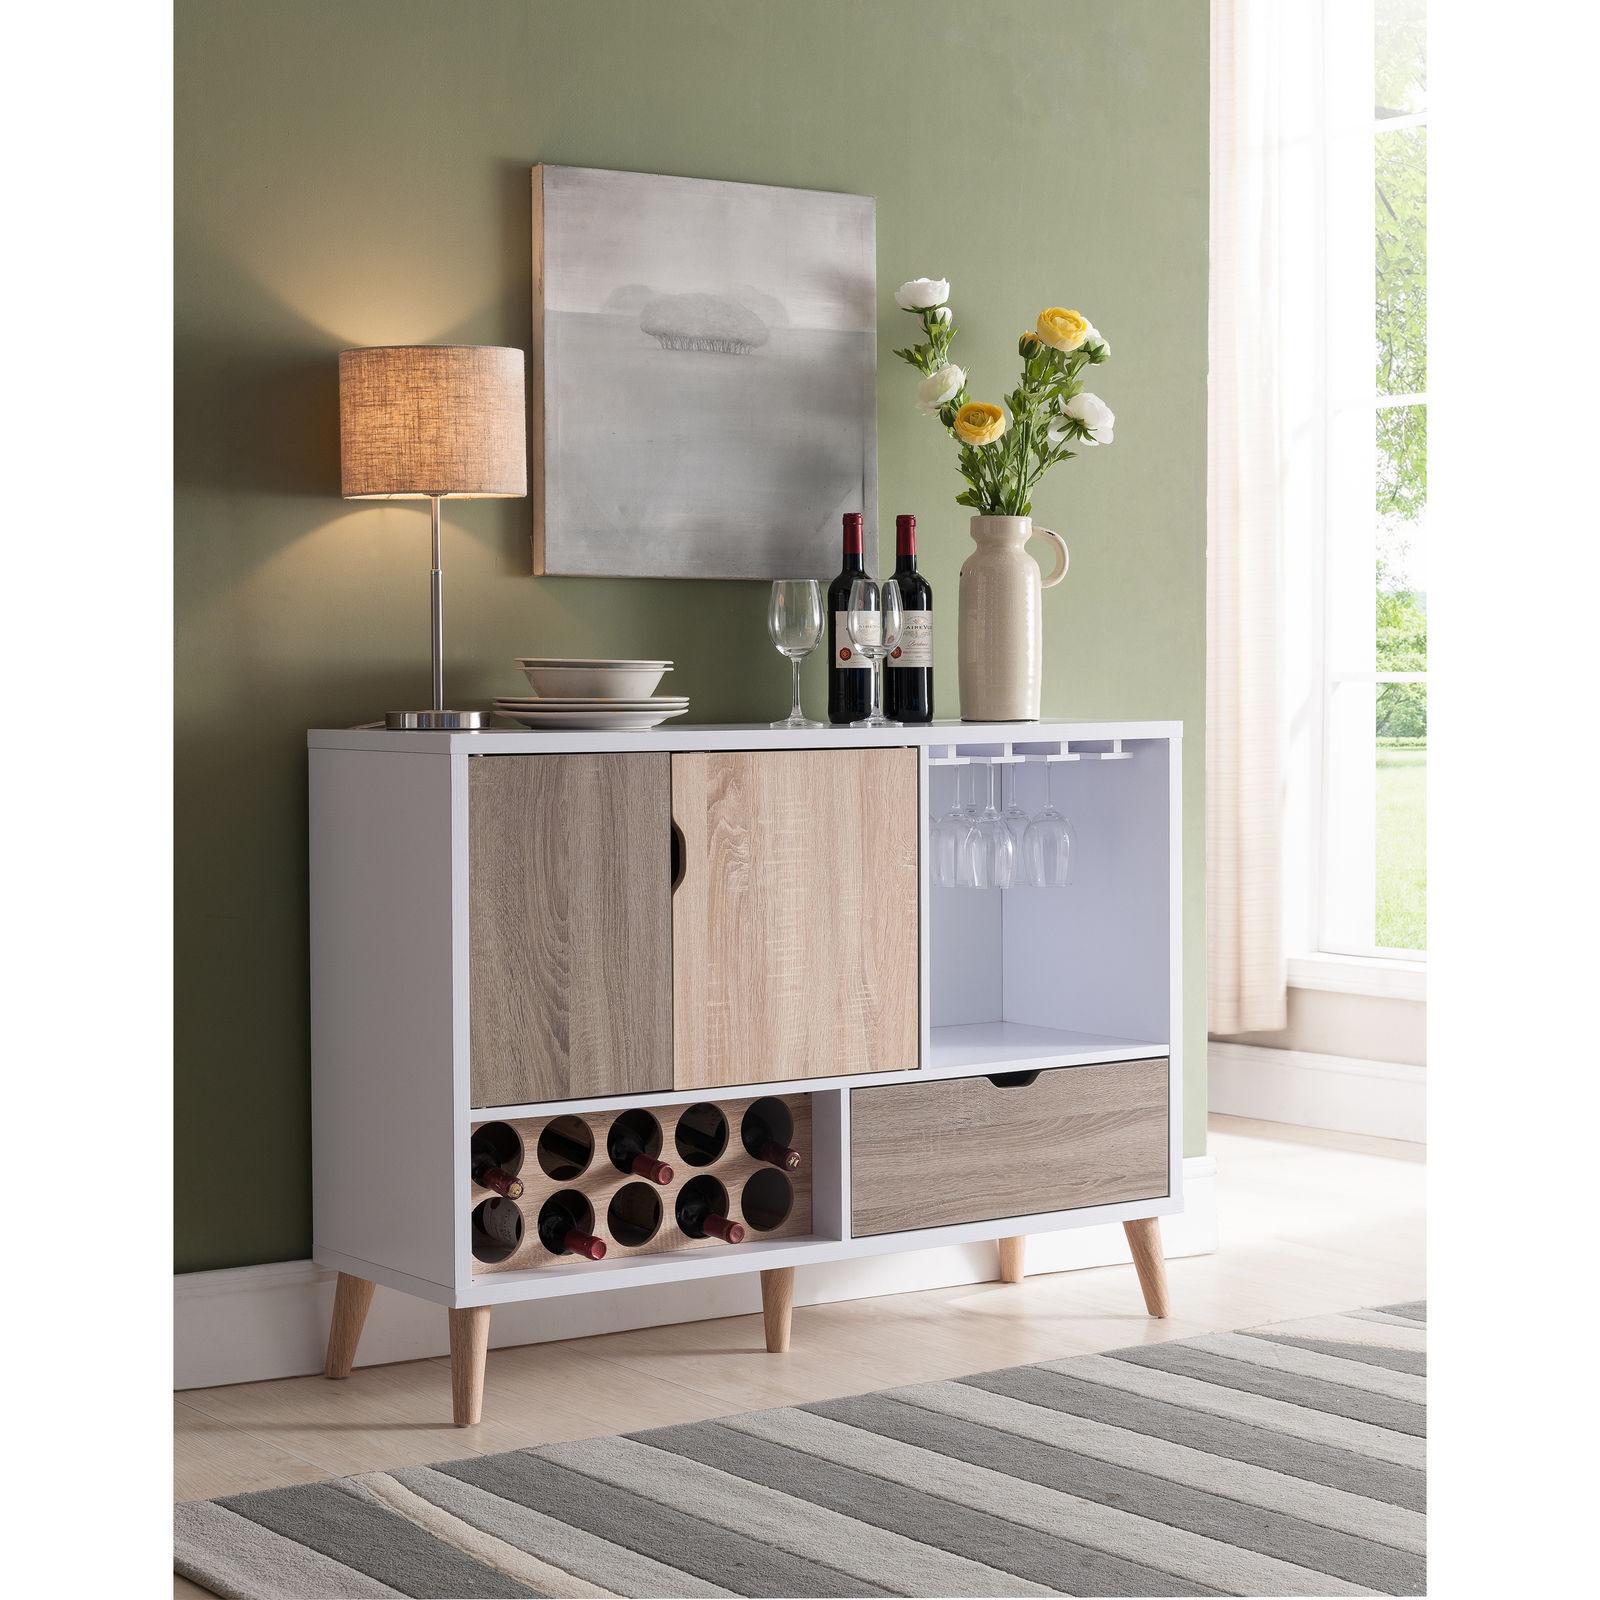 Modern Mid-Century Dining Room Storage Wine Rack Buffet Cabinet -  MULTI-COLORED